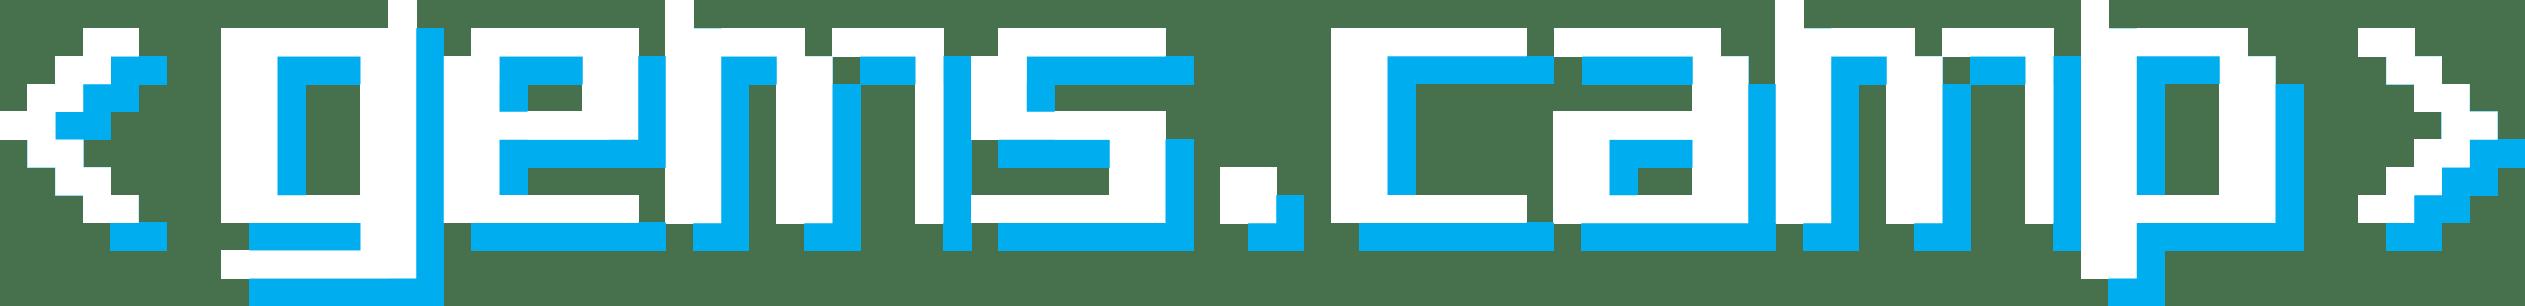 Illinois Computer Science - GEMS Branding